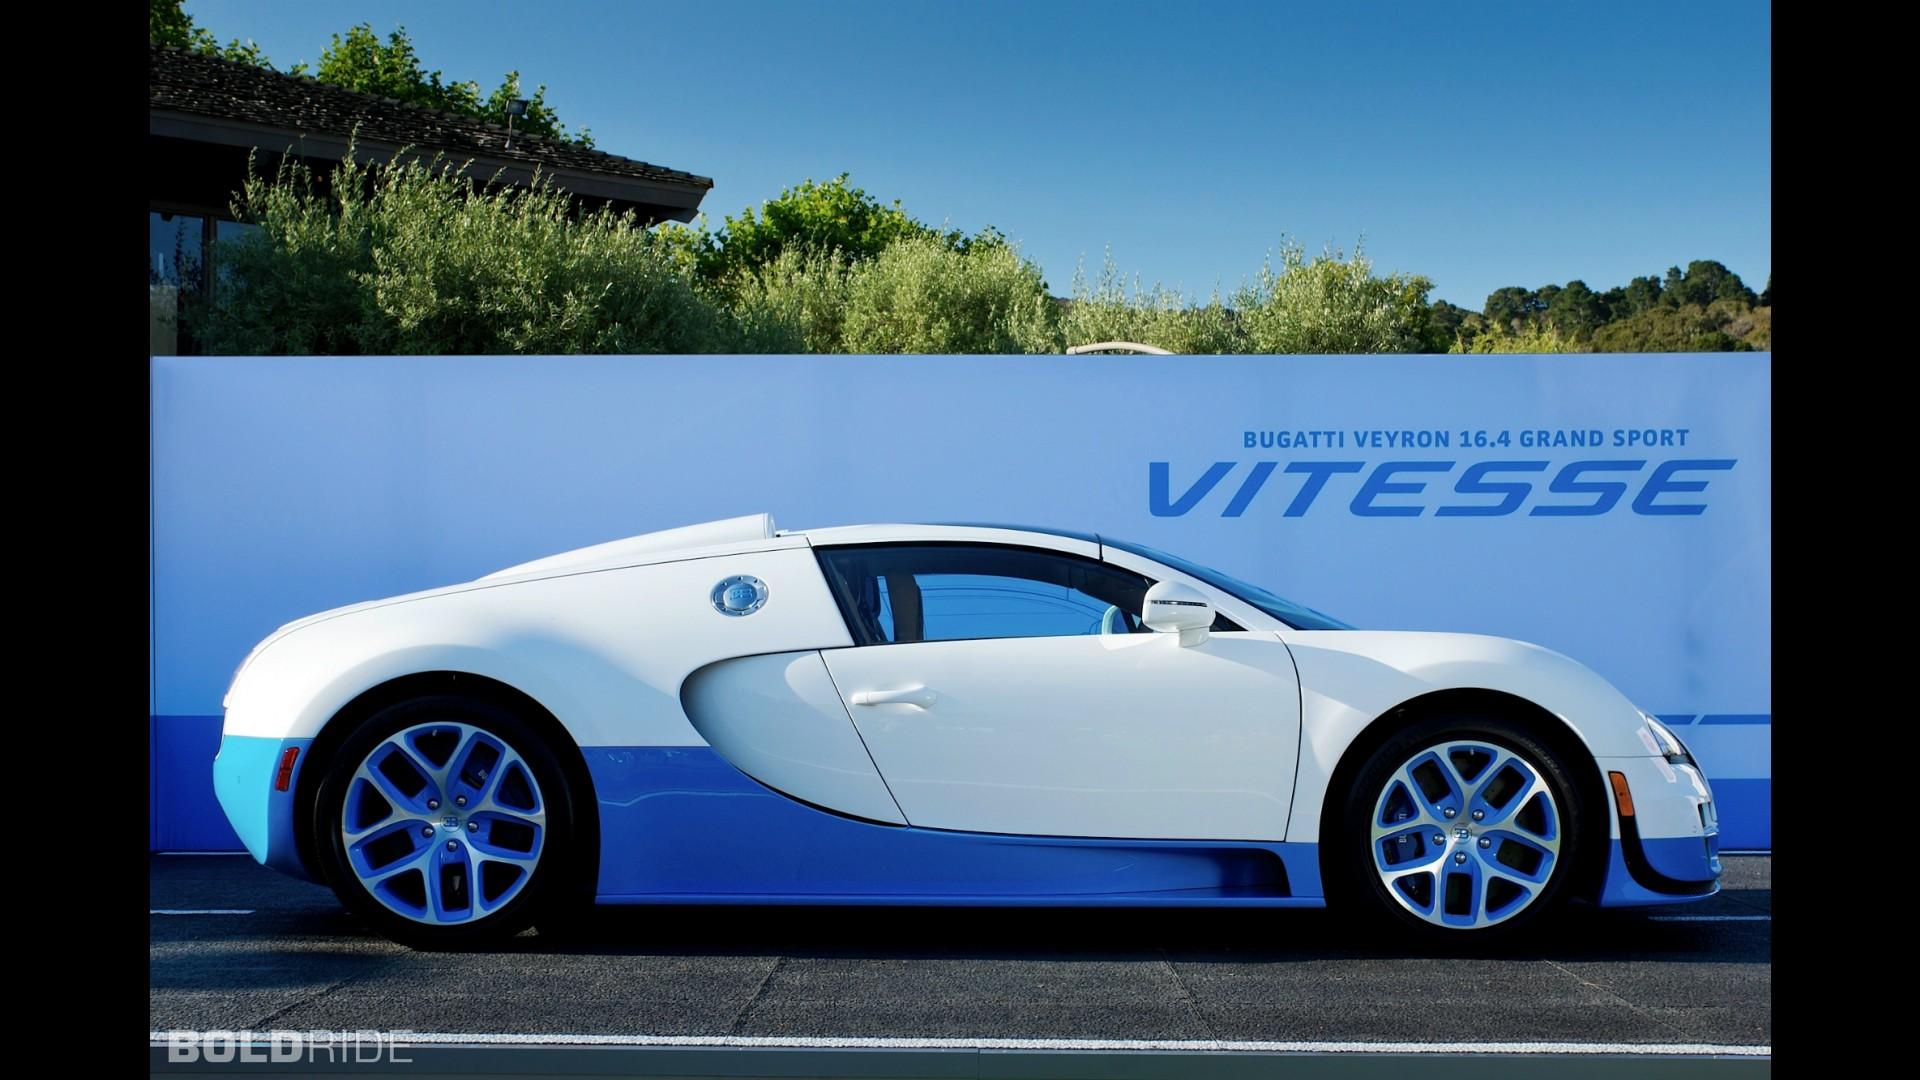 bugatti-veyron-16-4-grand-sport-vitesse-special-edition Terrific New Bugatti Veyron Grand Sport Vitesse Cars Trend